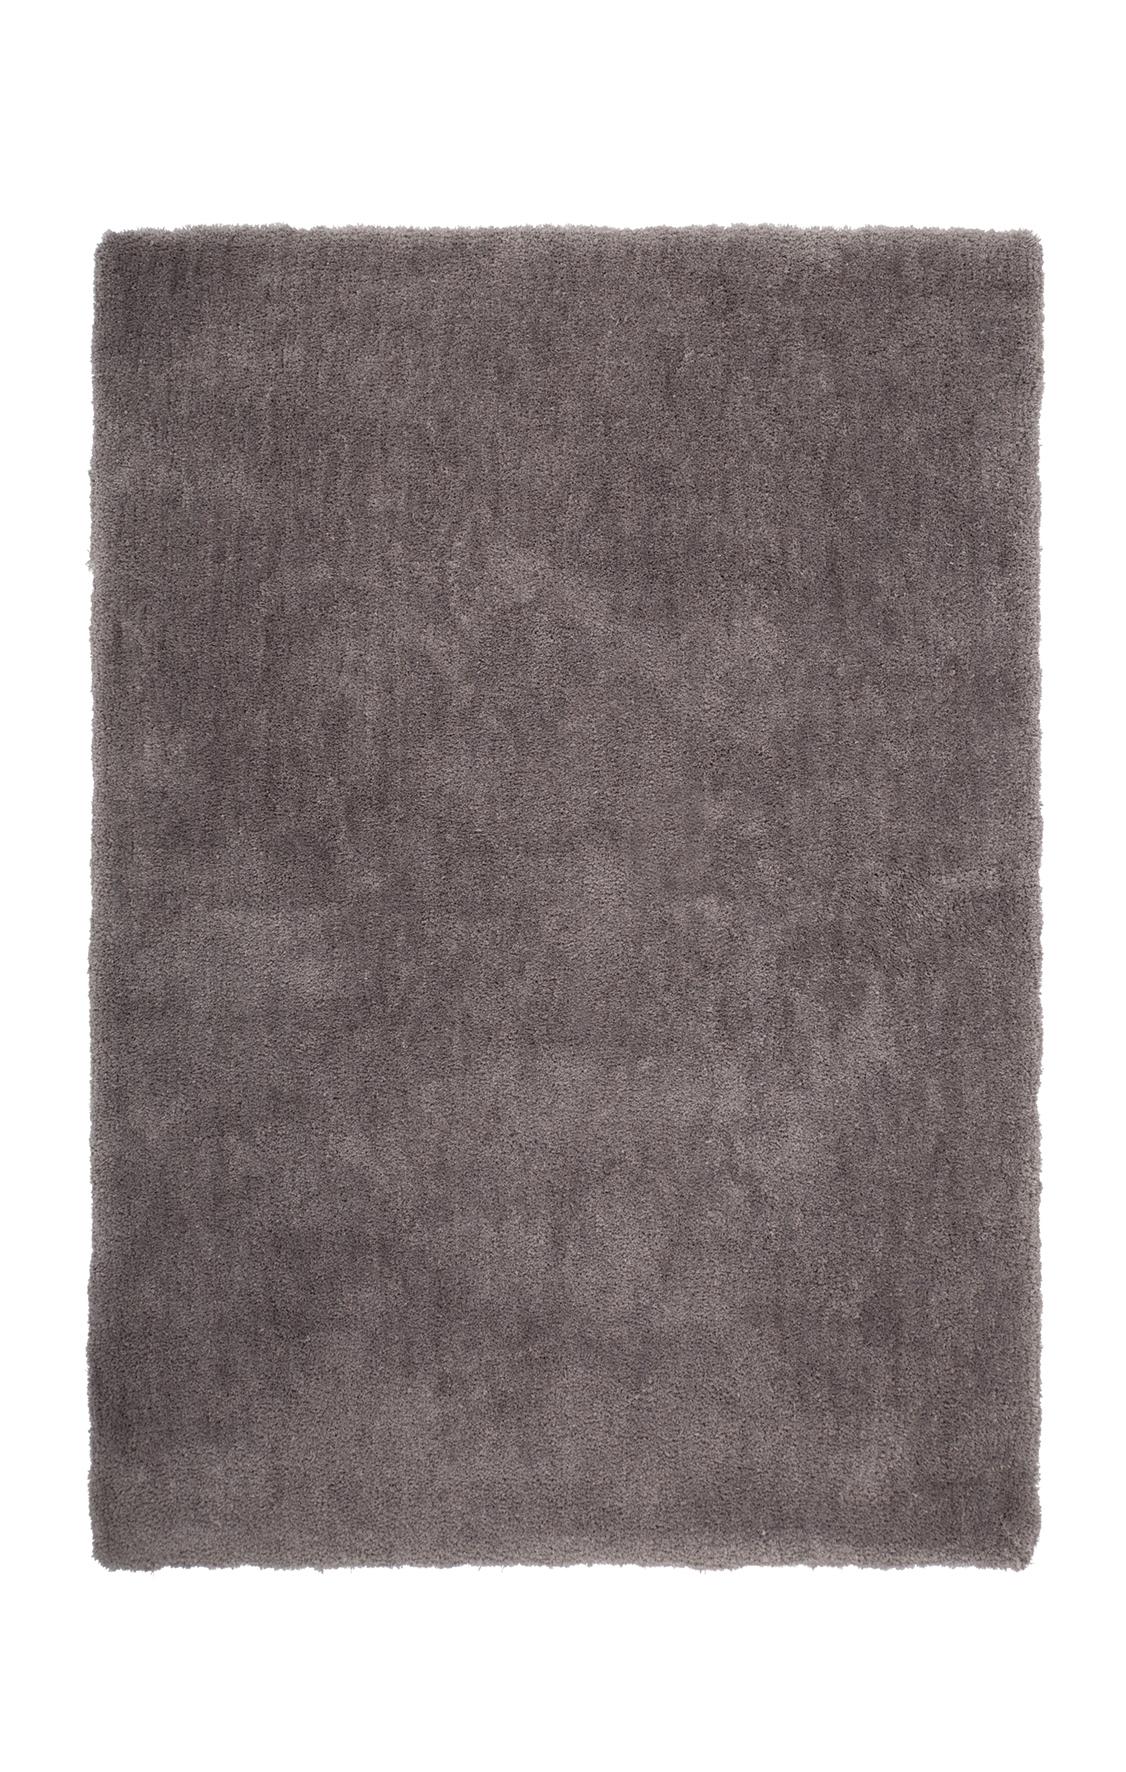 Obsession koberce Kusový koberec PARADISE 400 PLATIN - 80x150 cm Expres